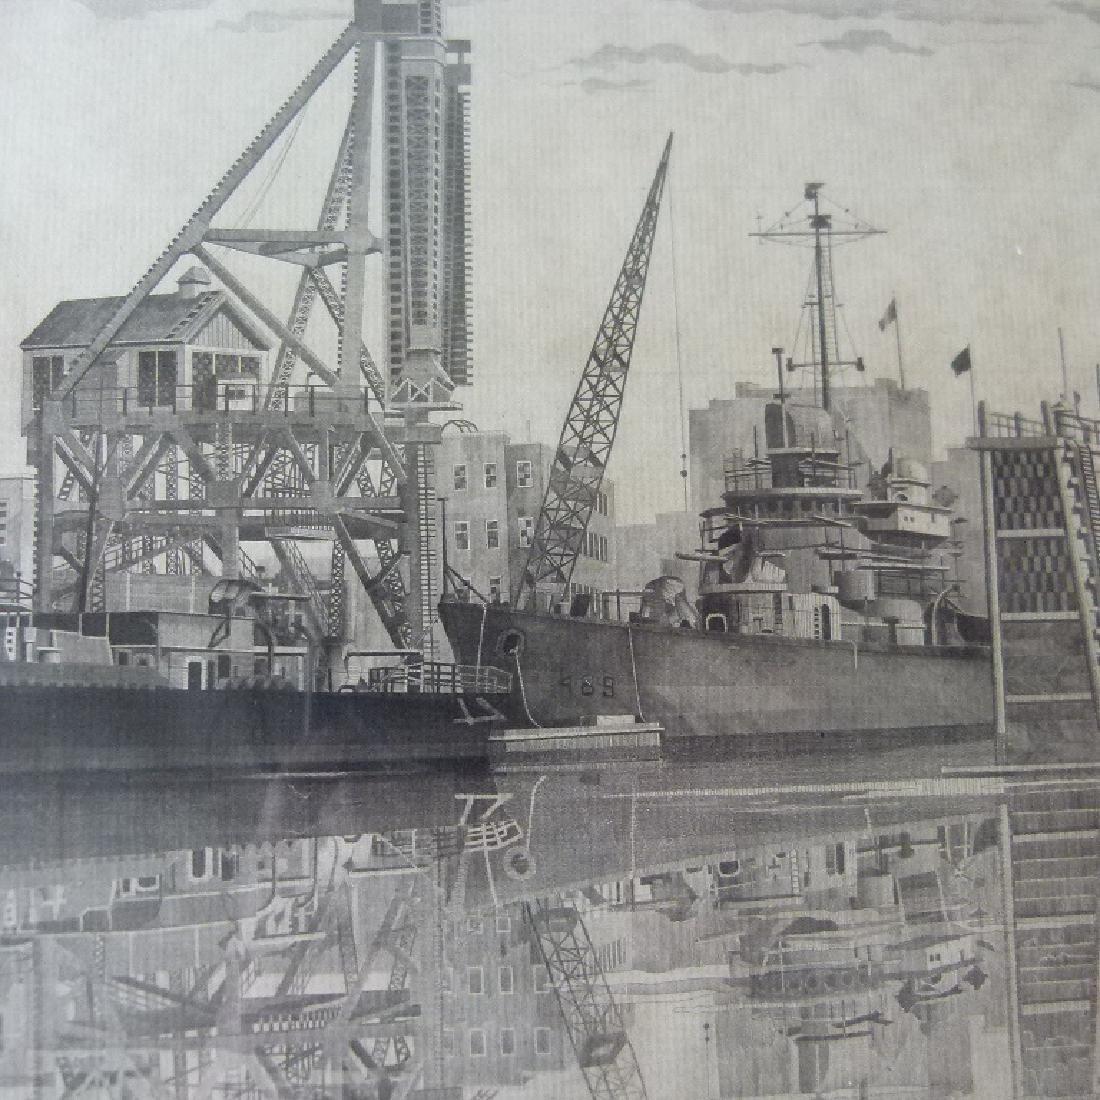 SOFT GROUND ETCHING, USS RADNOR, SIGNED - 8